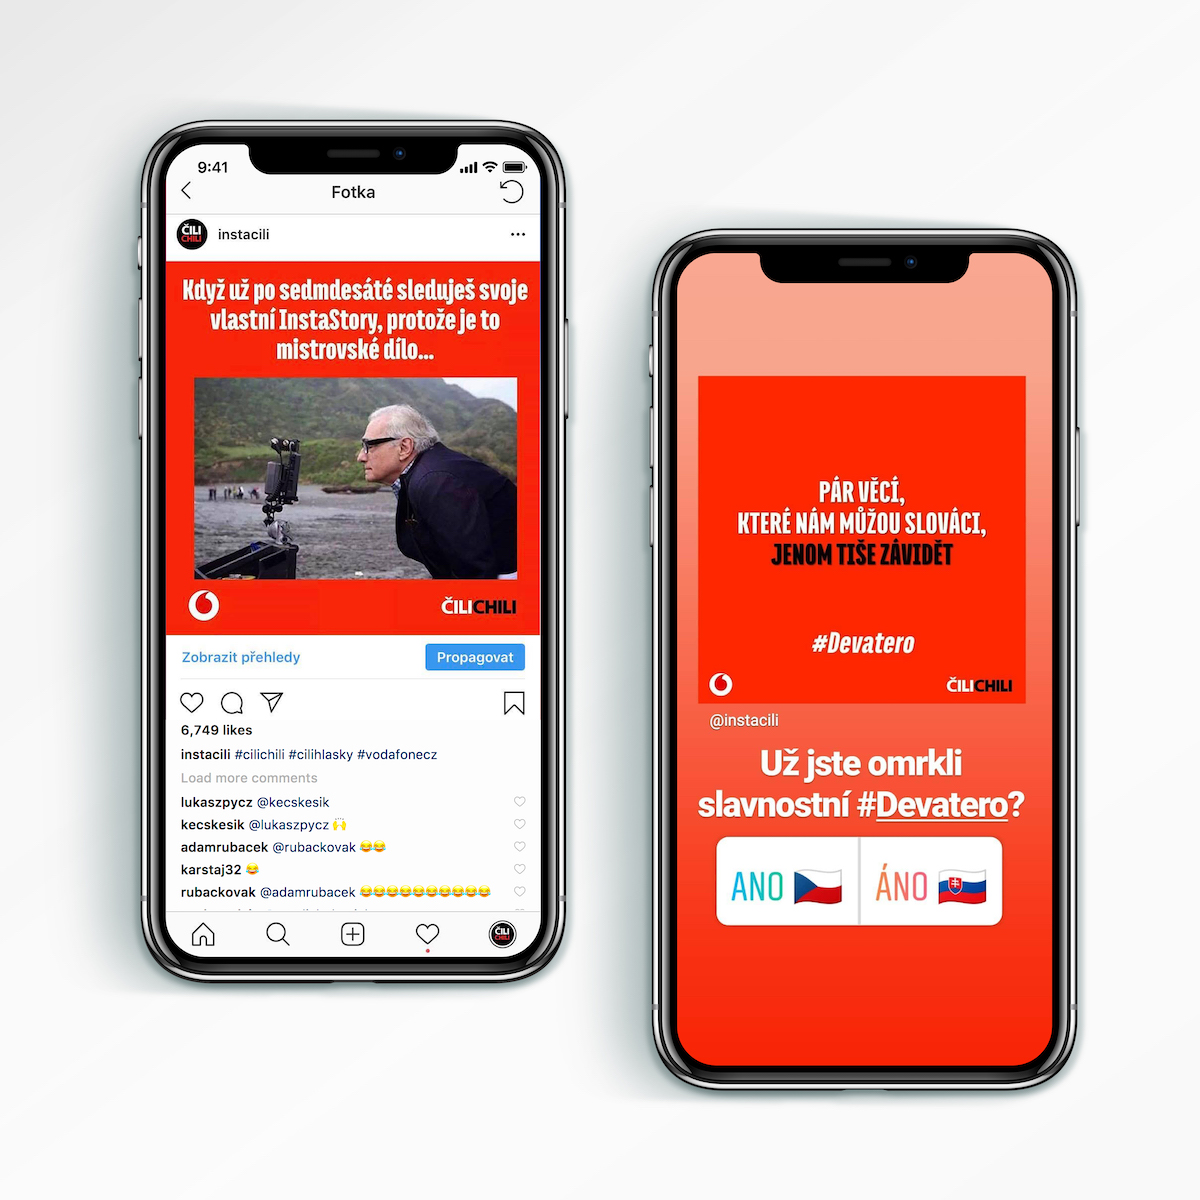 Jak Vodafone komunikuje na Instagramu